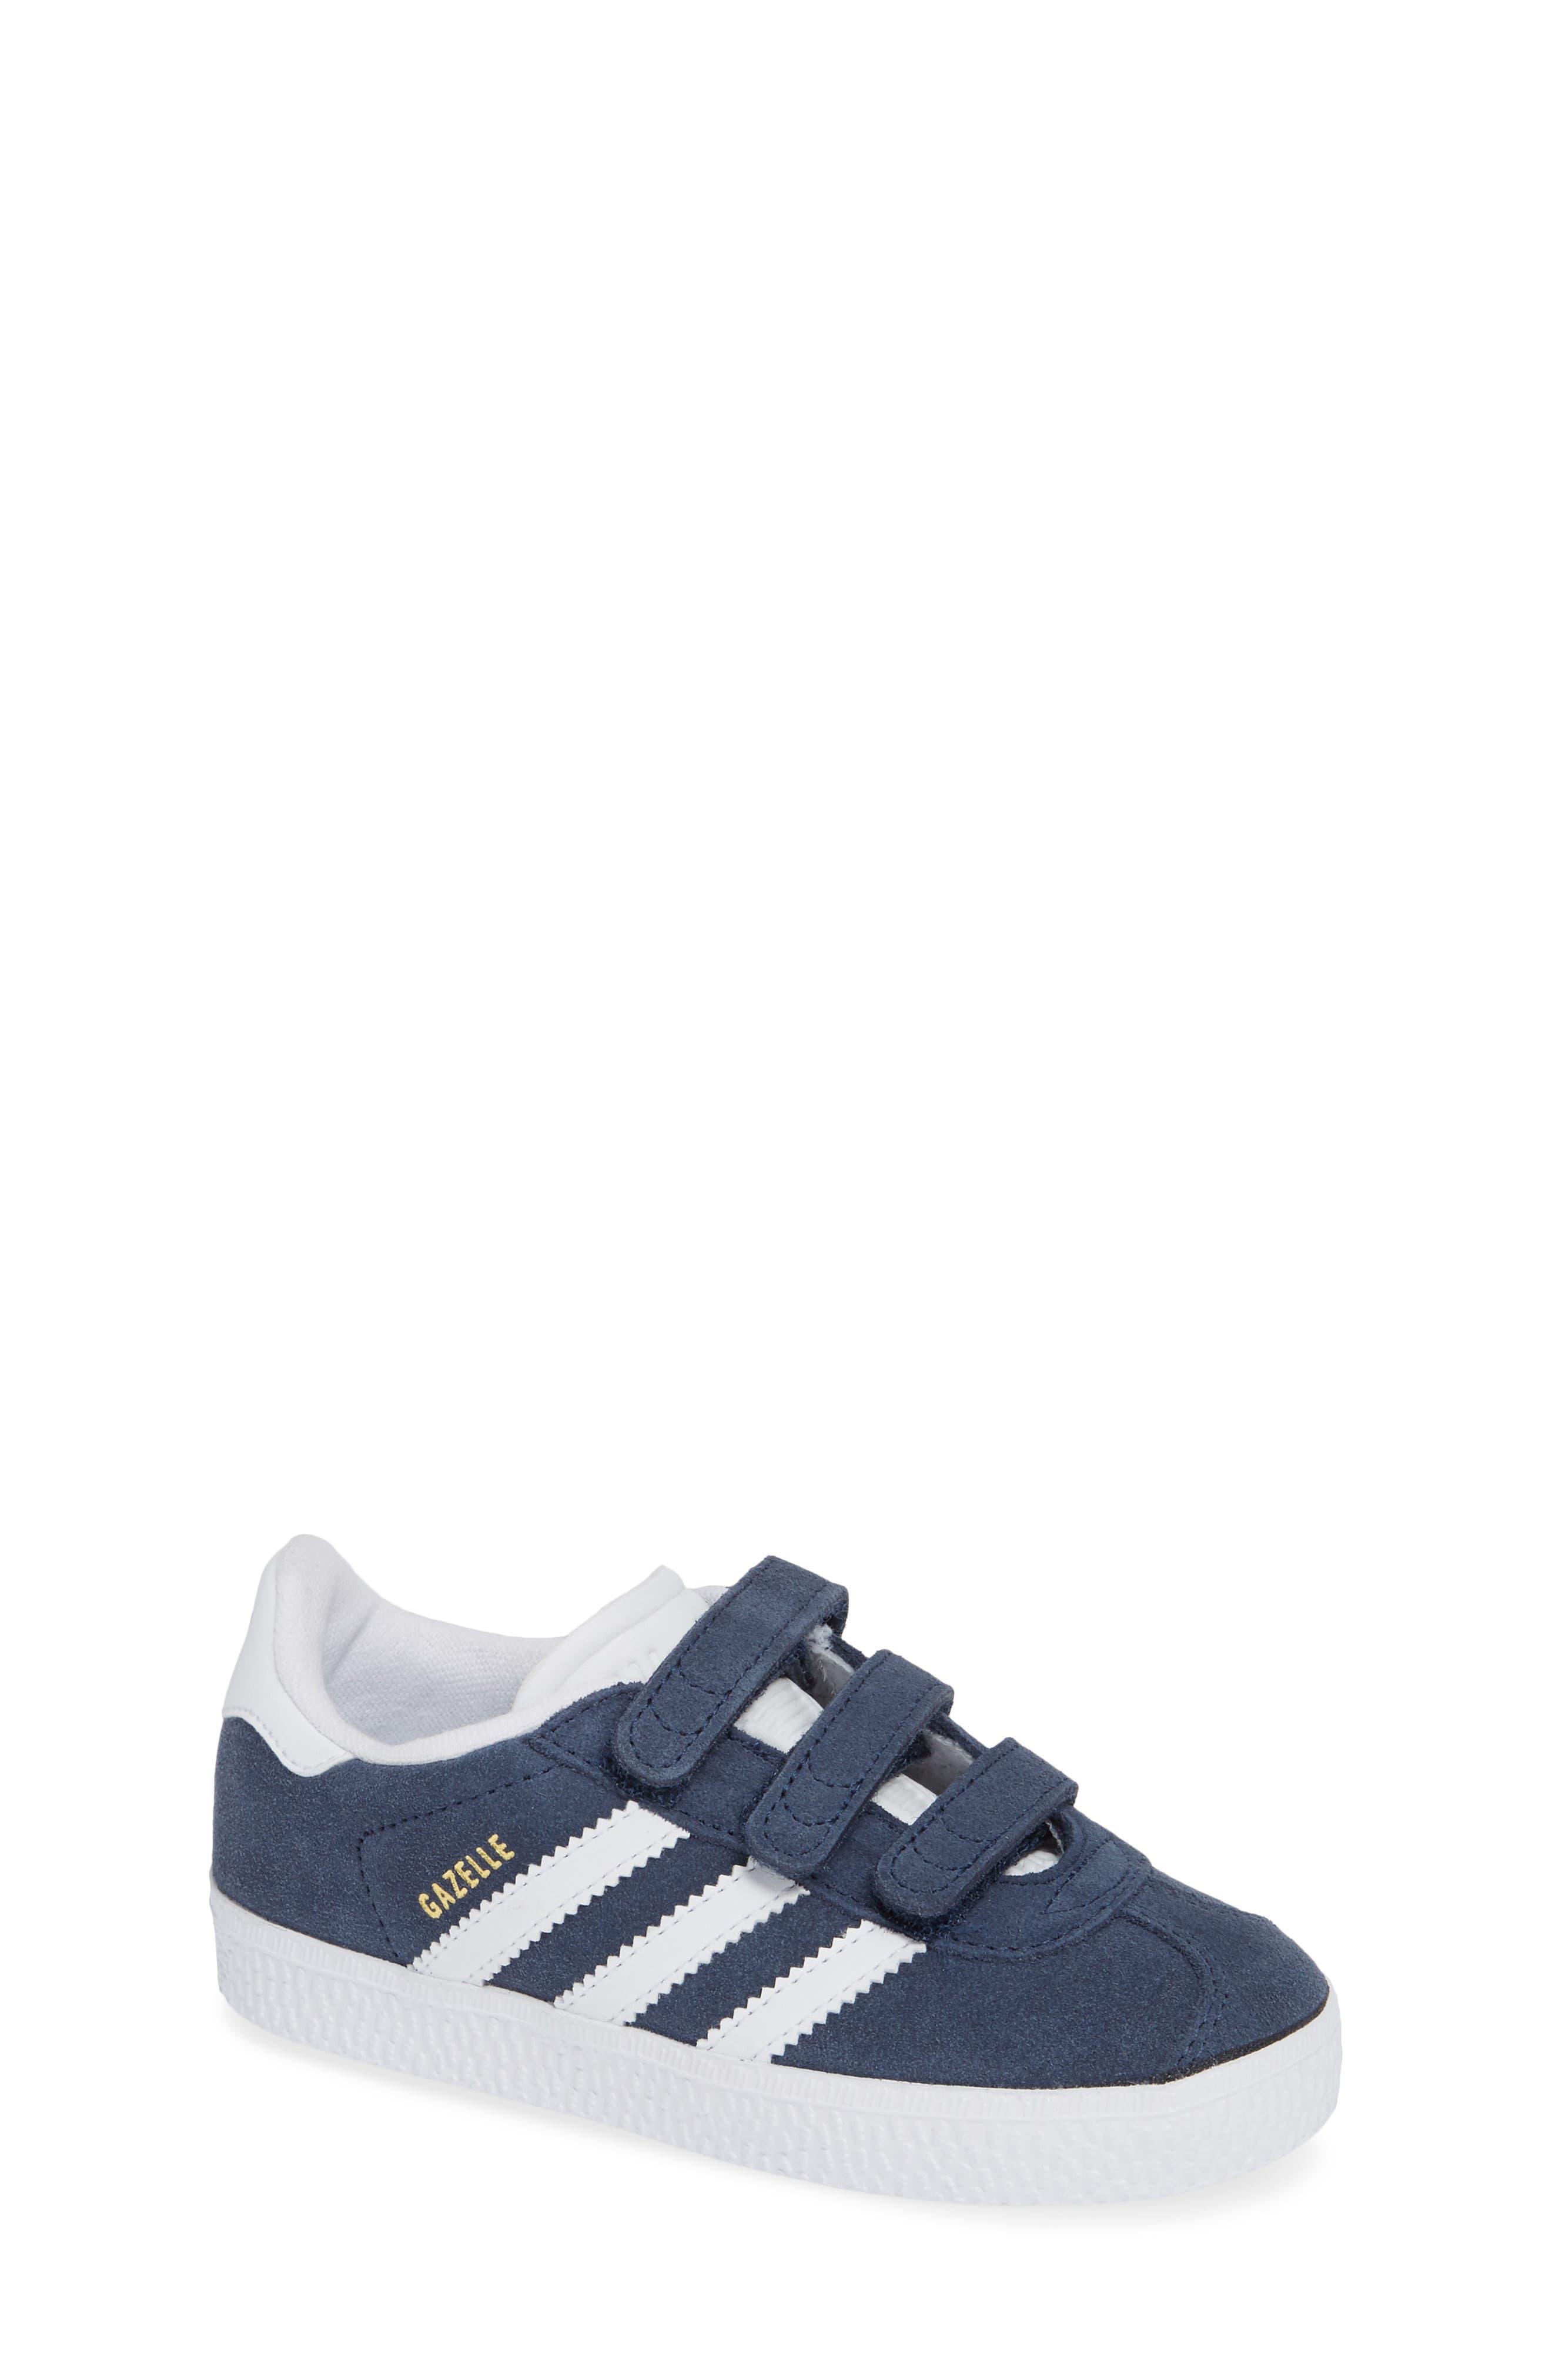 Gazelle Sneaker,                             Main thumbnail 1, color,                             NAVY/ WHITE